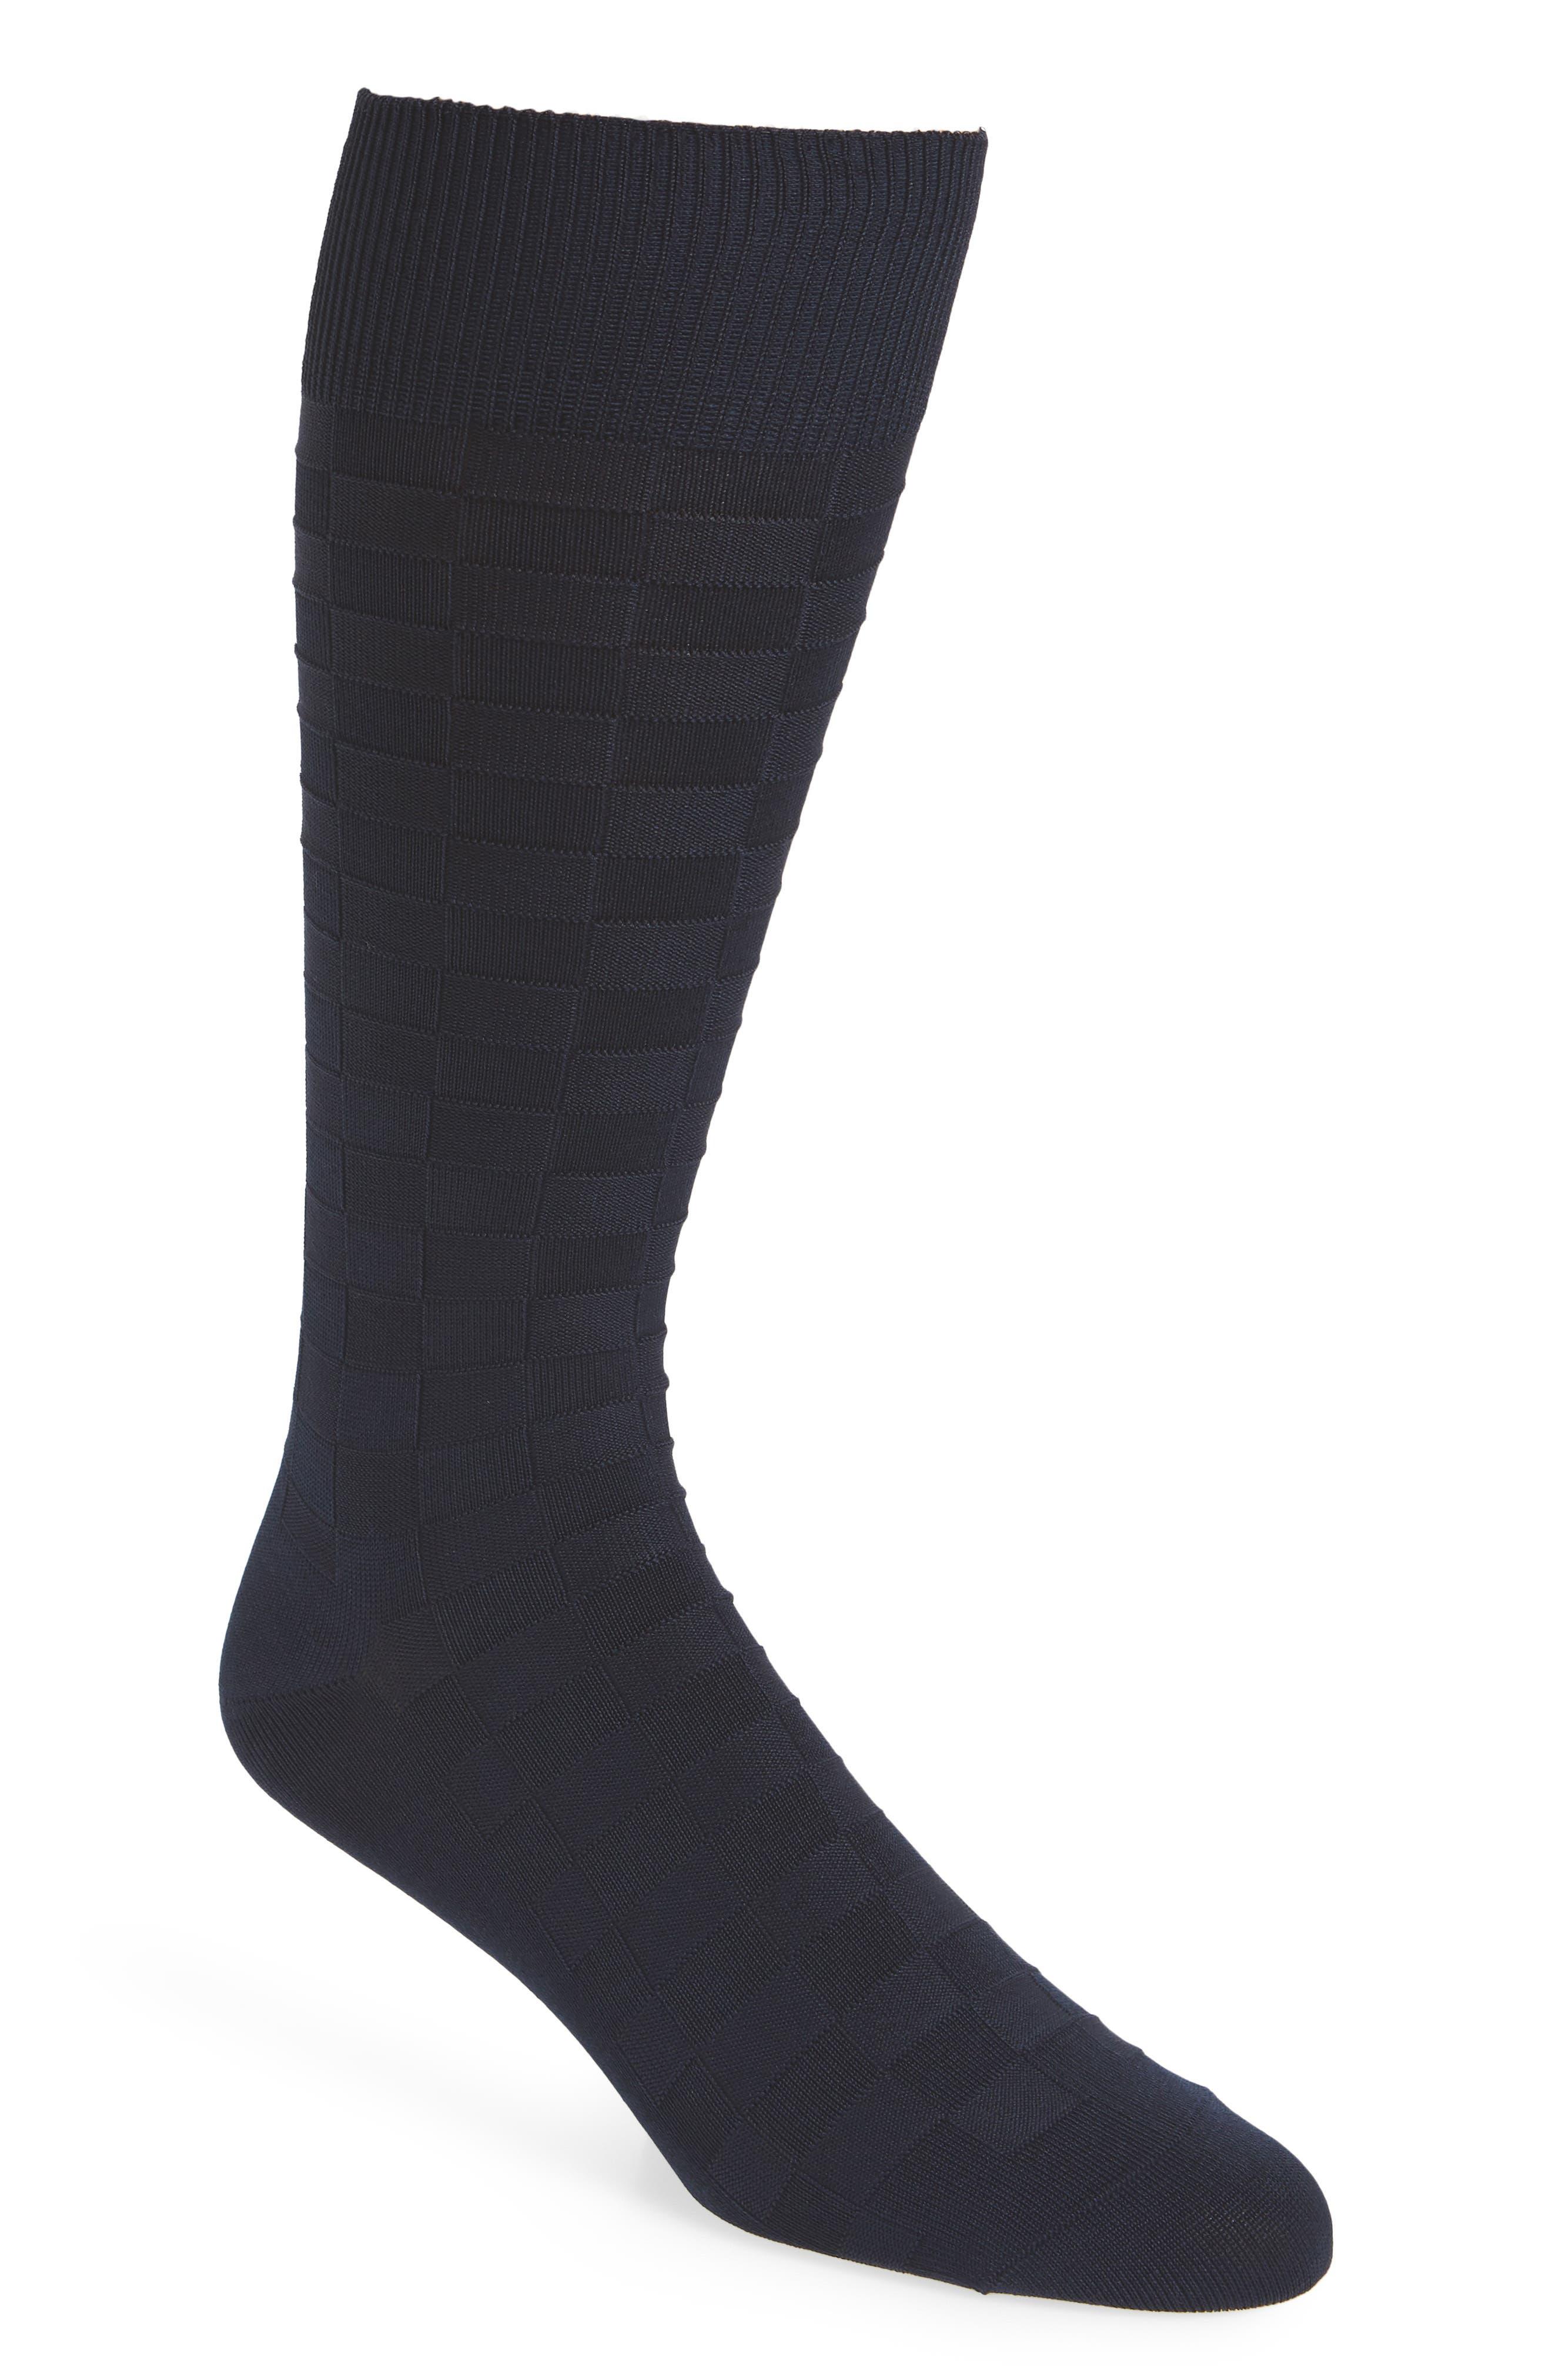 Grid Socks,                         Main,                         color, Navy